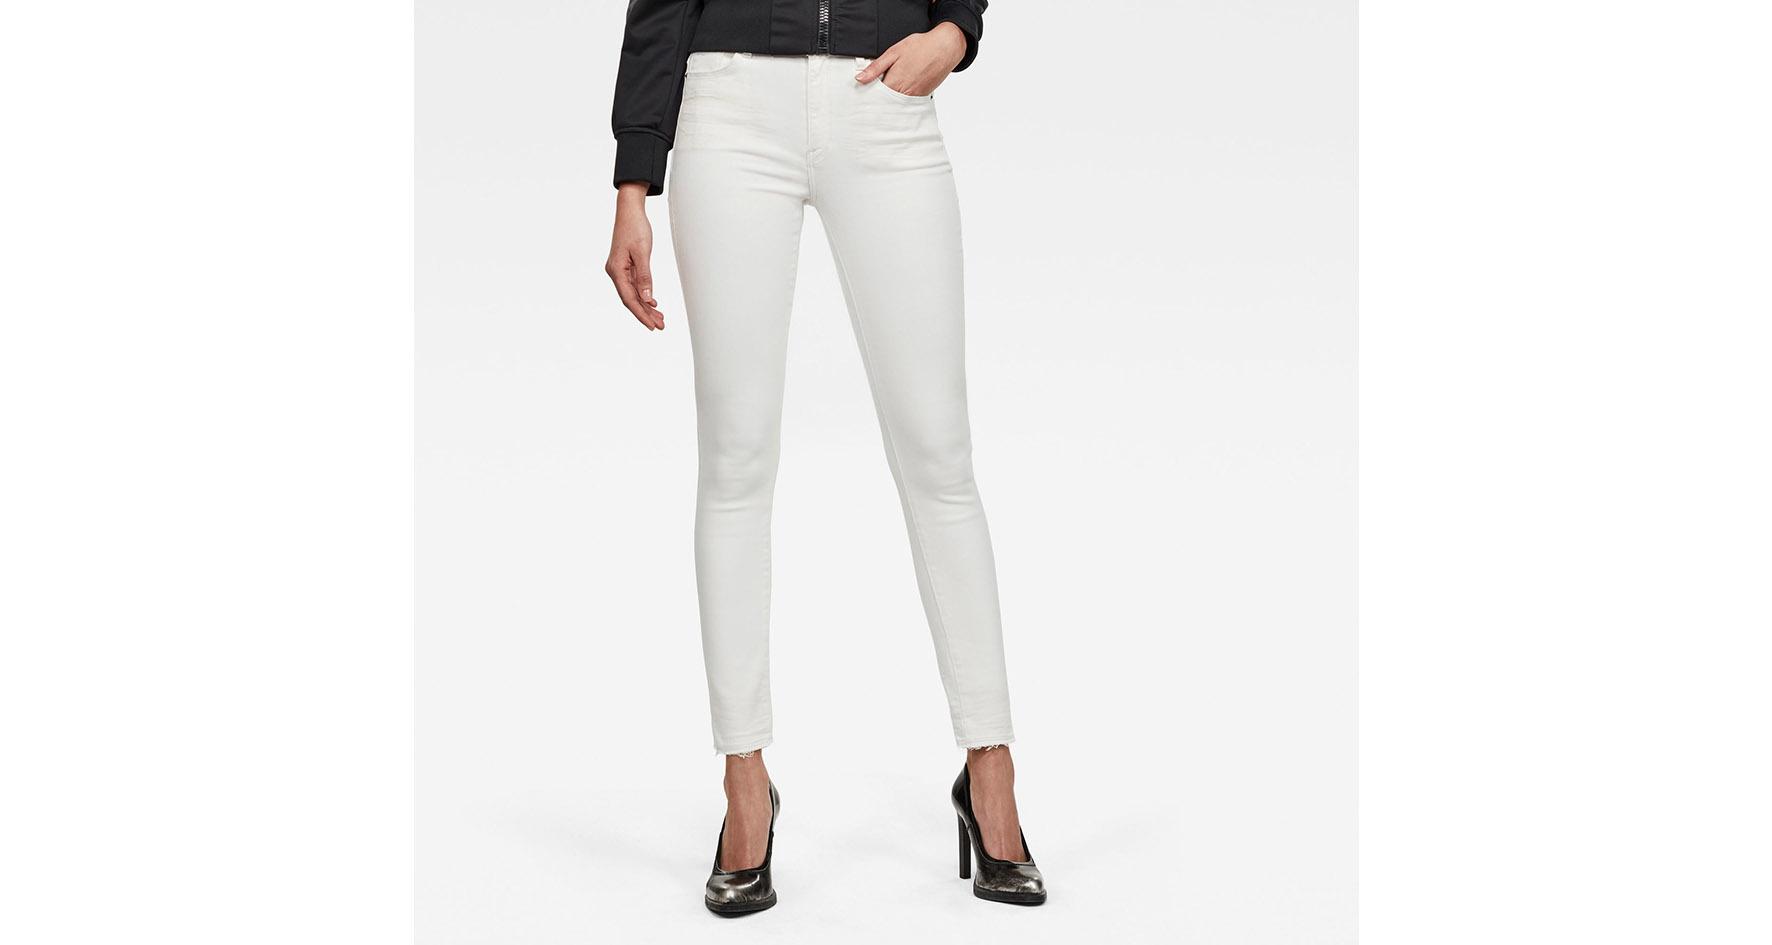 De witte jeans